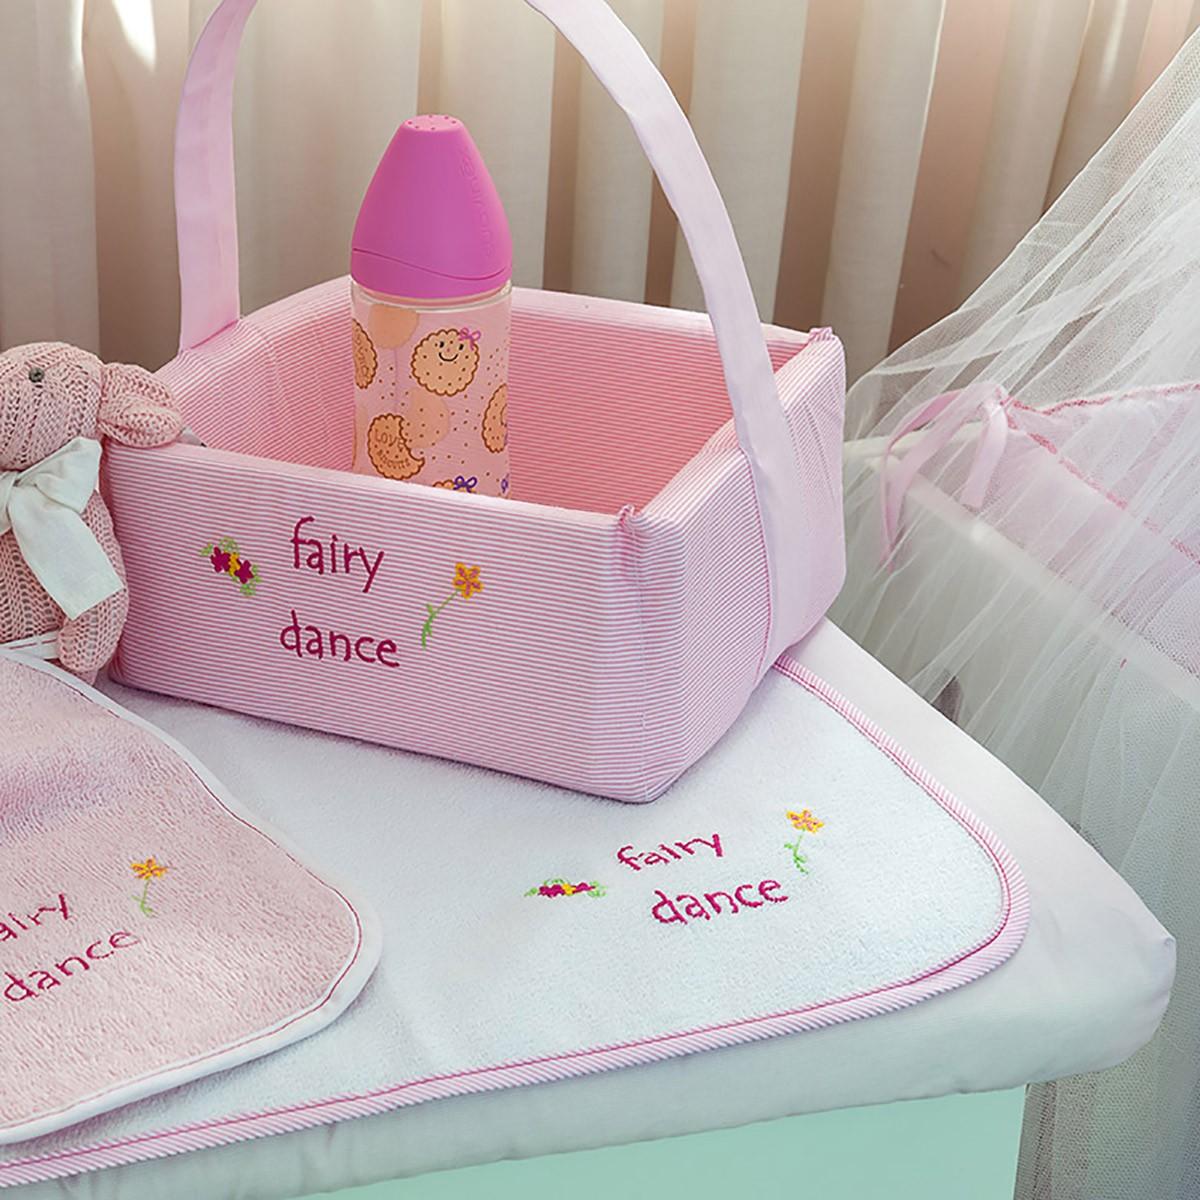 322bf0e560f Καλαθάκι Καλλυντικών Baby Oliver Fairy Dance 307 85129